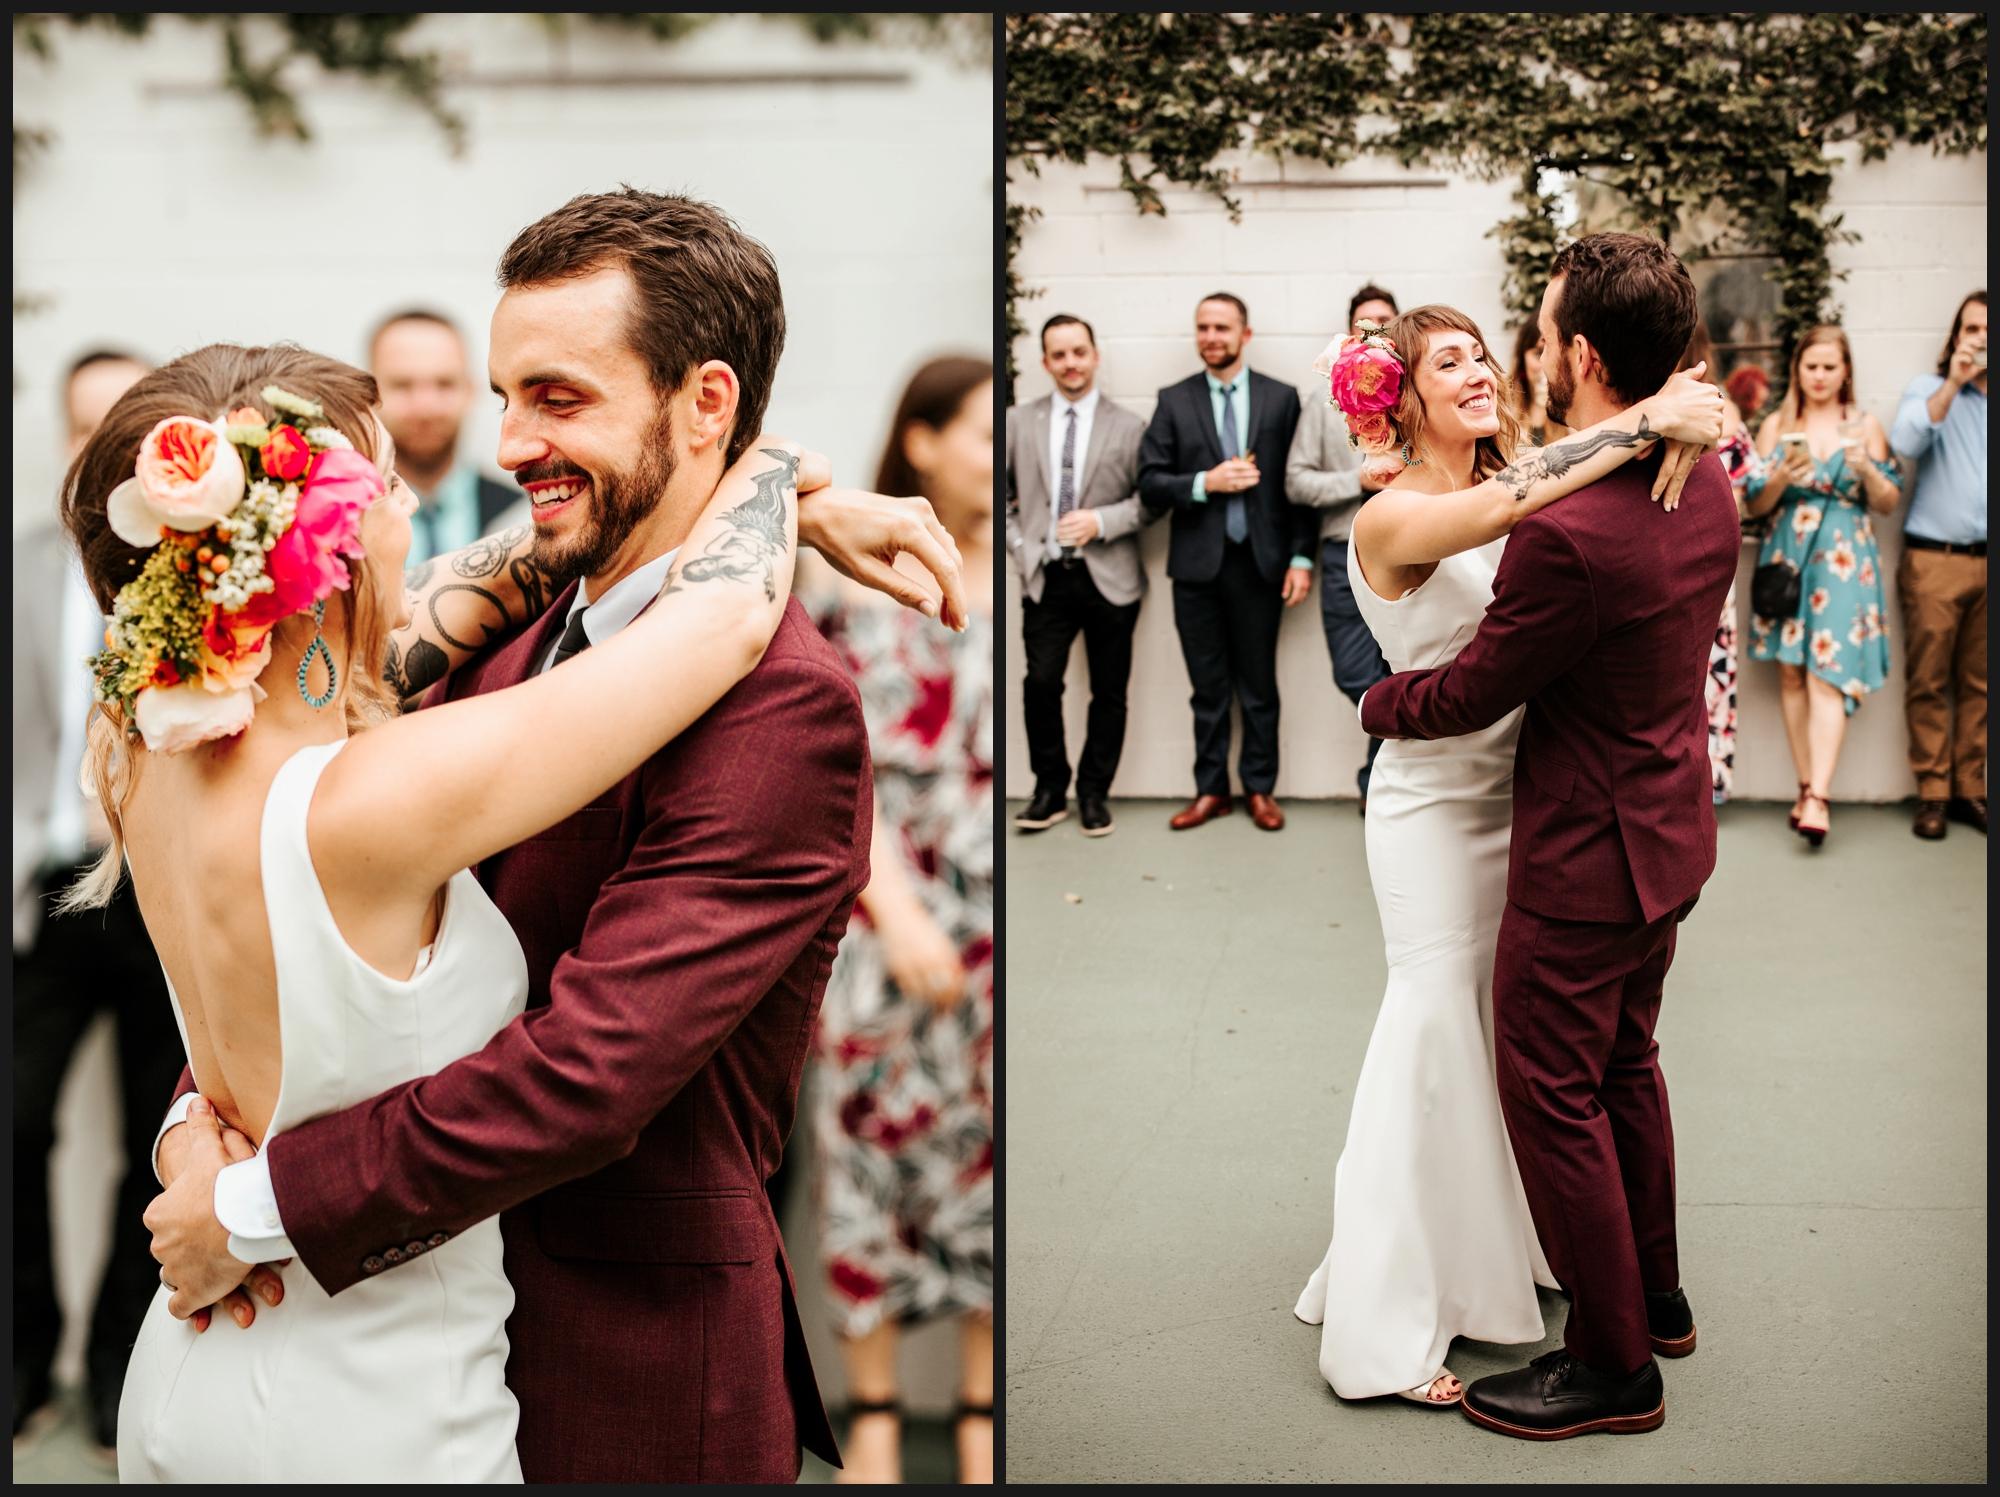 Orlando-Wedding-Photographer-destination-wedding-photographer-florida-wedding-photographer-bohemian-wedding-photographer_1951.jpg